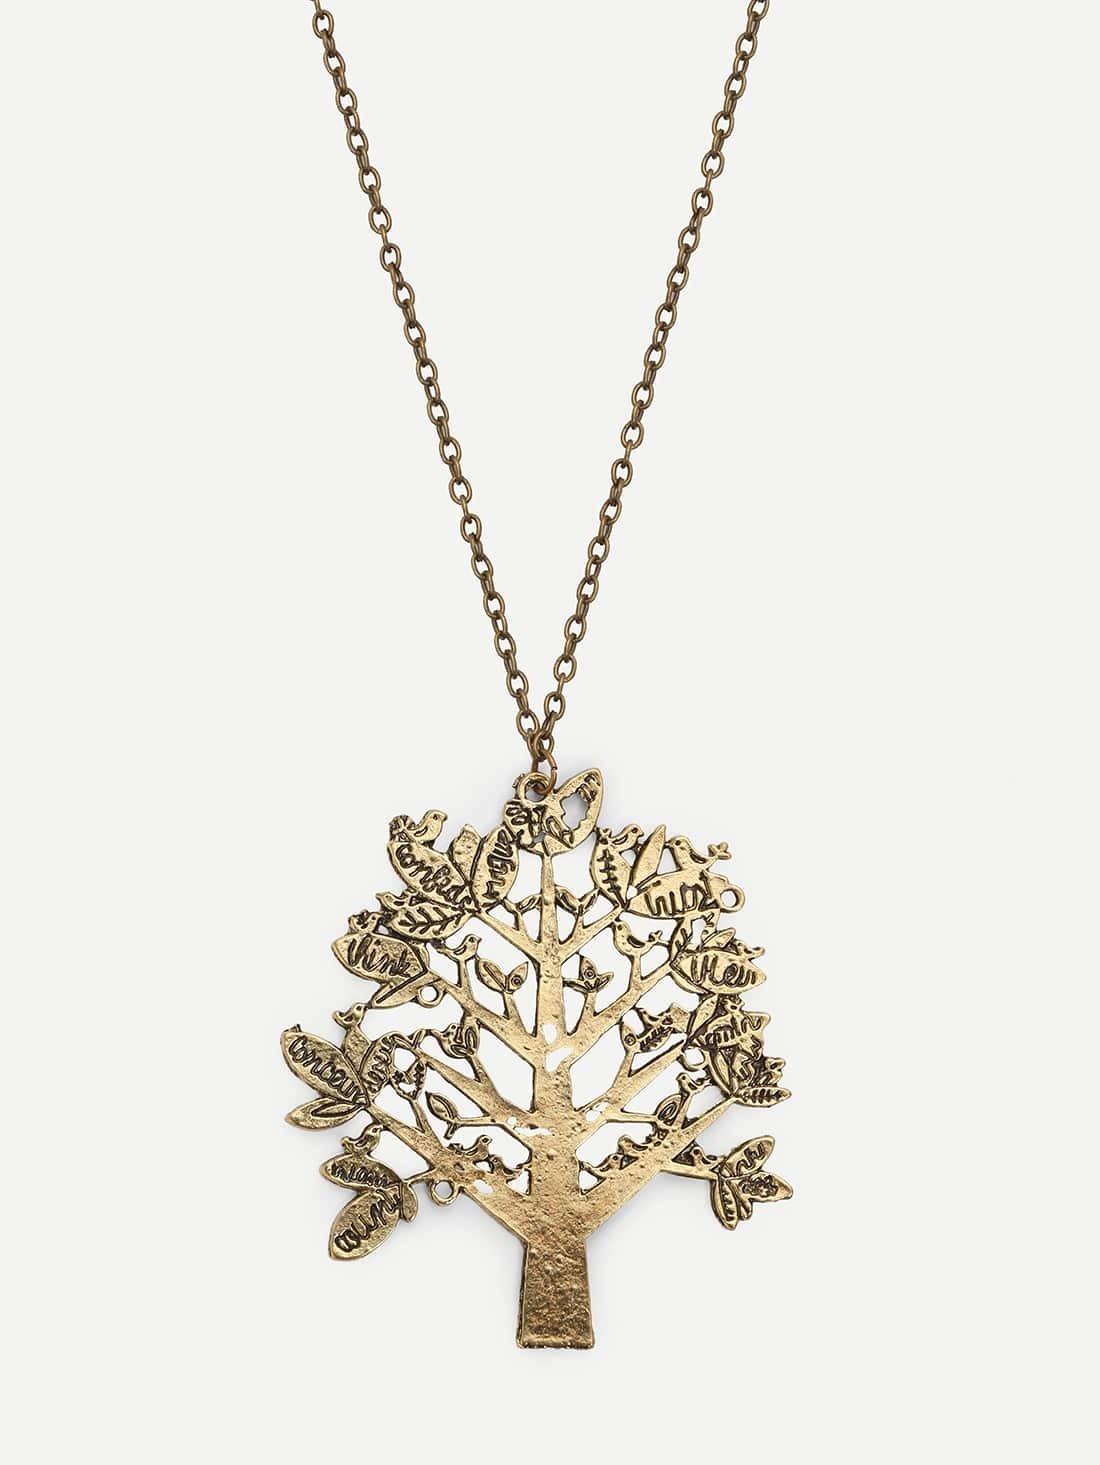 Collier avec pendentif en forme d 39 arbre french shein sheinside - Arbre a collier ...